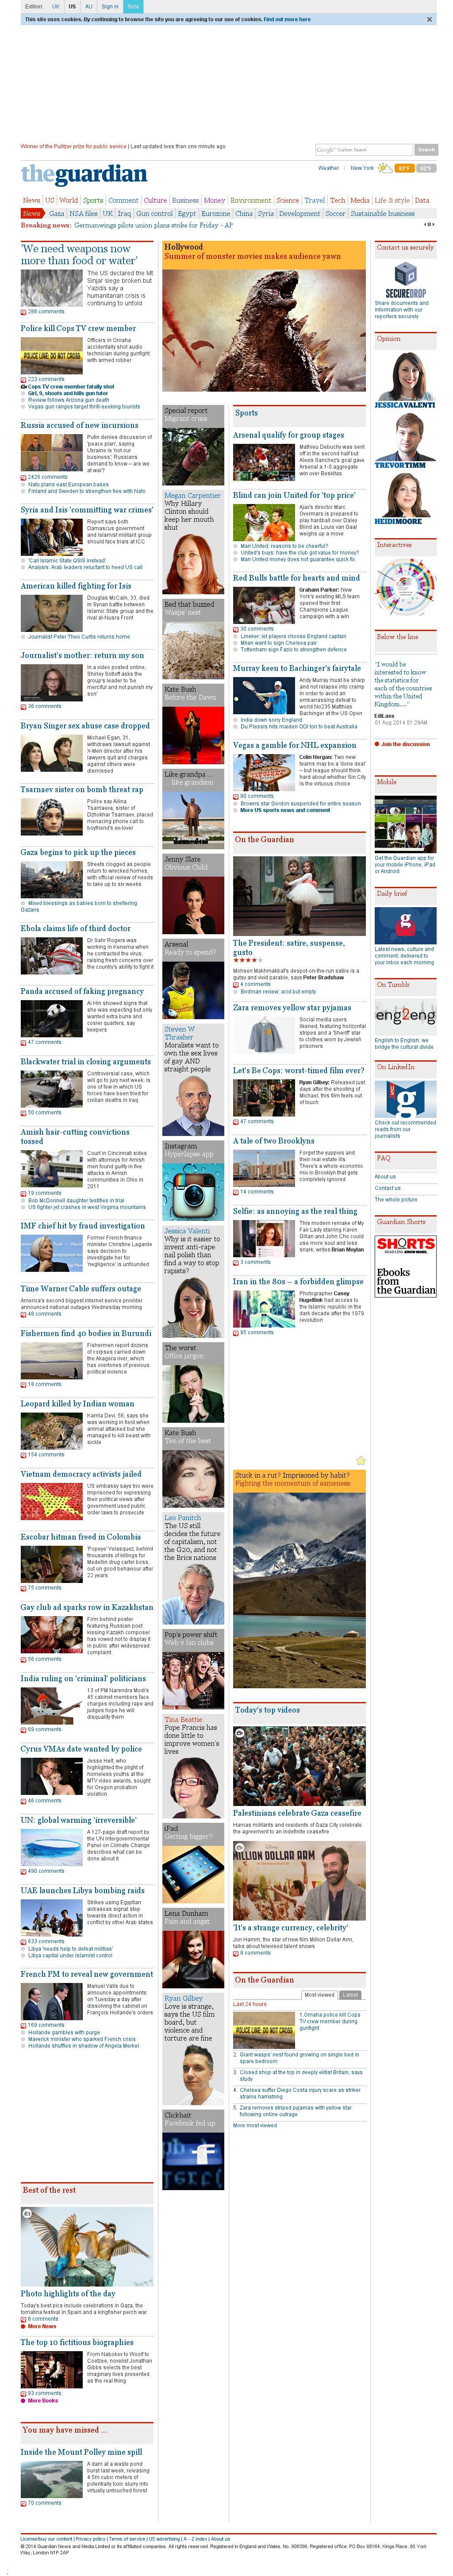 The Guardian at Thursday Aug. 28, 2014, 7:07 a.m. UTC